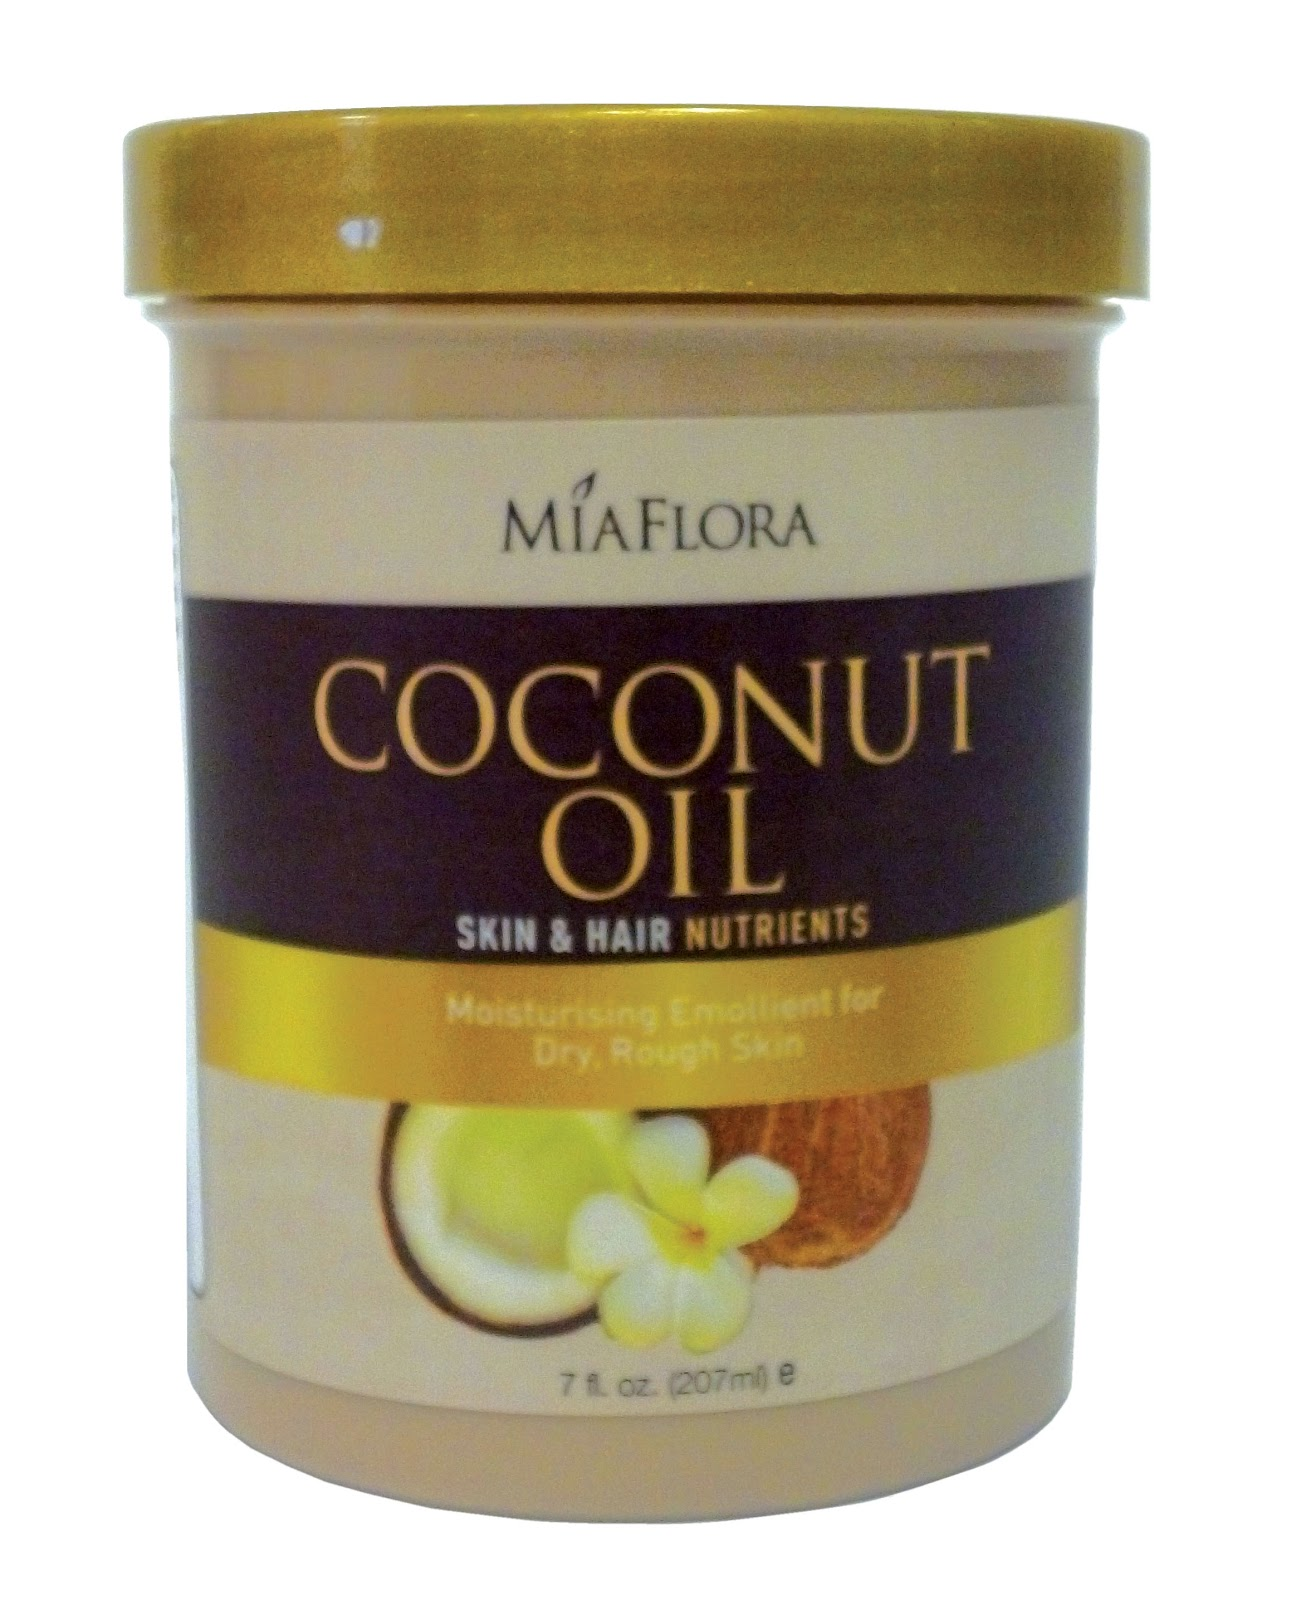 http://3.bp.blogspot.com/-xQKX3SOgy2k/ULTKrIsi0PI/AAAAAAAADMY/xro5jrtSdJg/s1600/Miaflora+Coconut+Oil.jpg